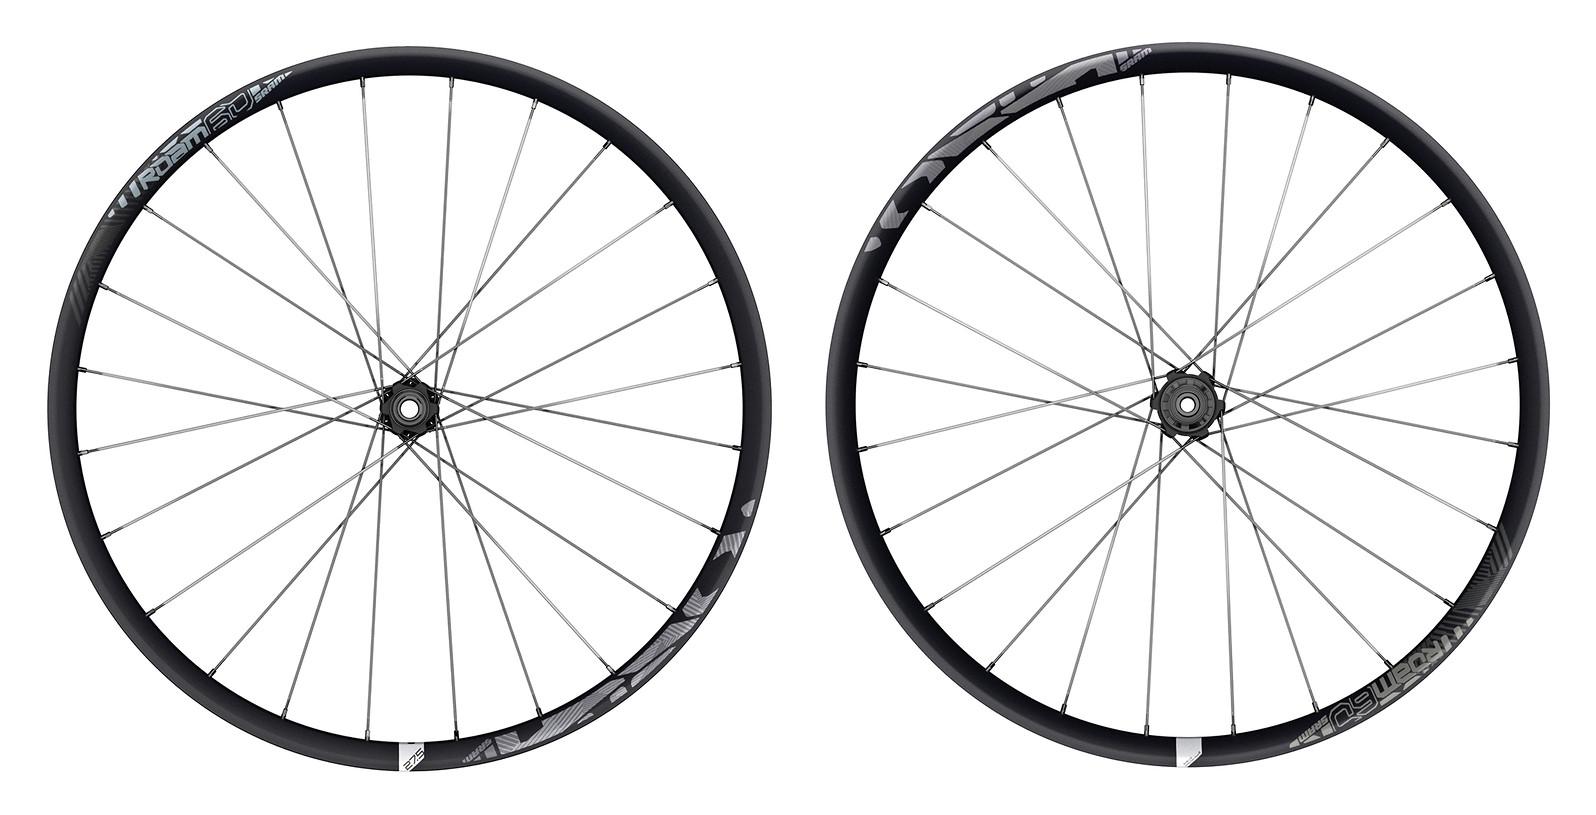 08a2e7d38a9 SRAM ROAM 60 Wheelset - Reviews, Comparisons, Specs - Mountain Bike ...